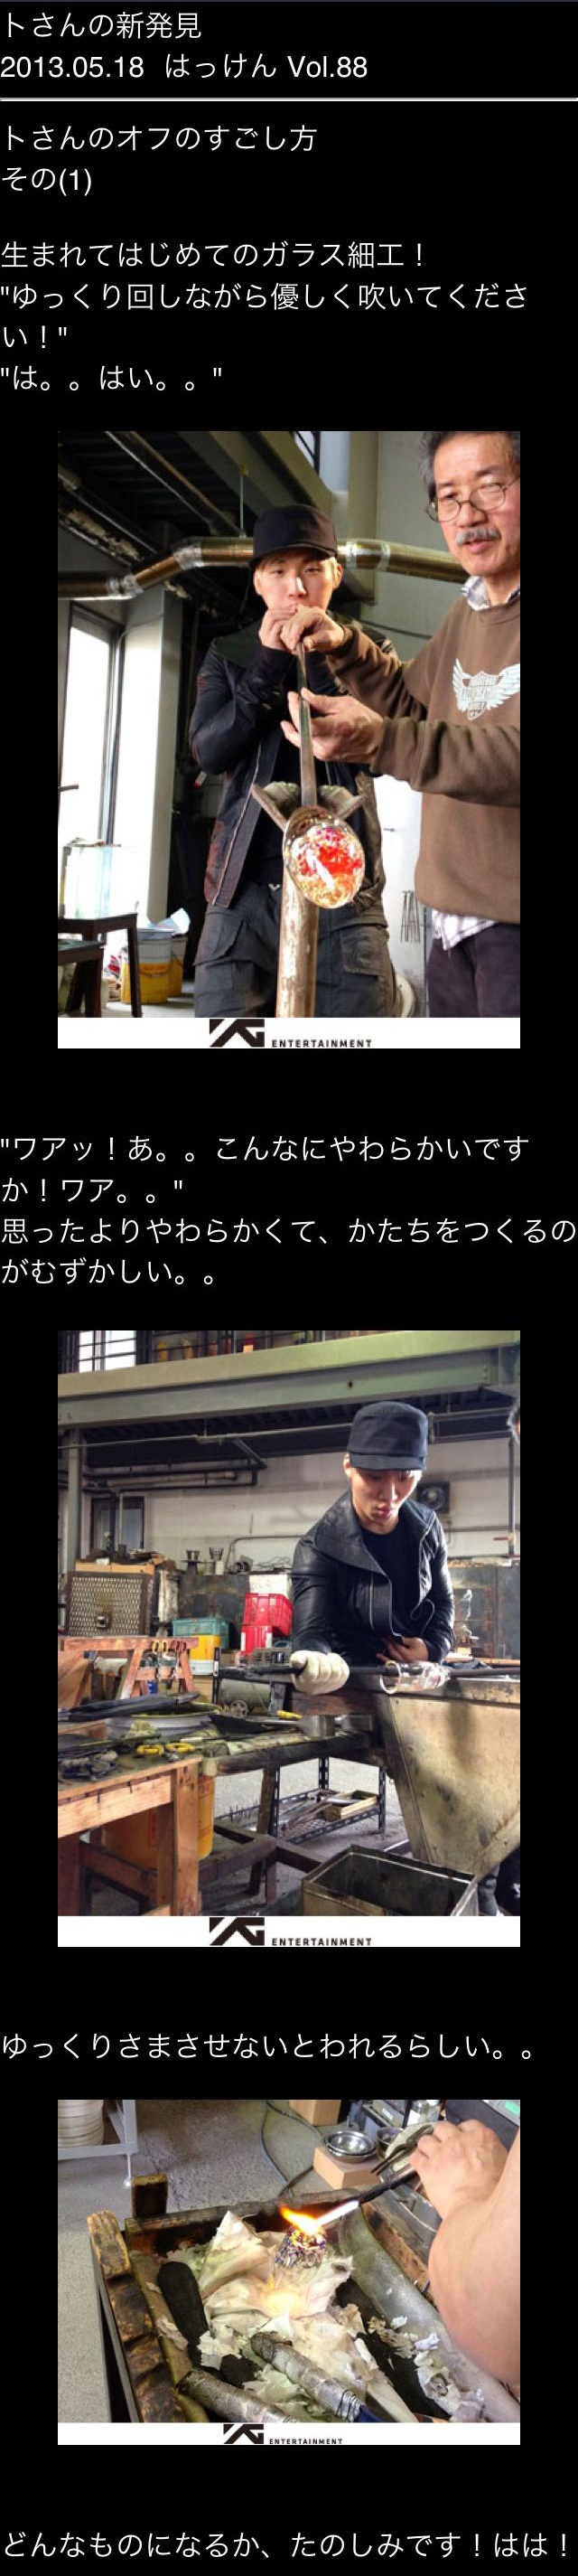 Dae Sung - To-san - Vol.88 - 18may2013.jpg